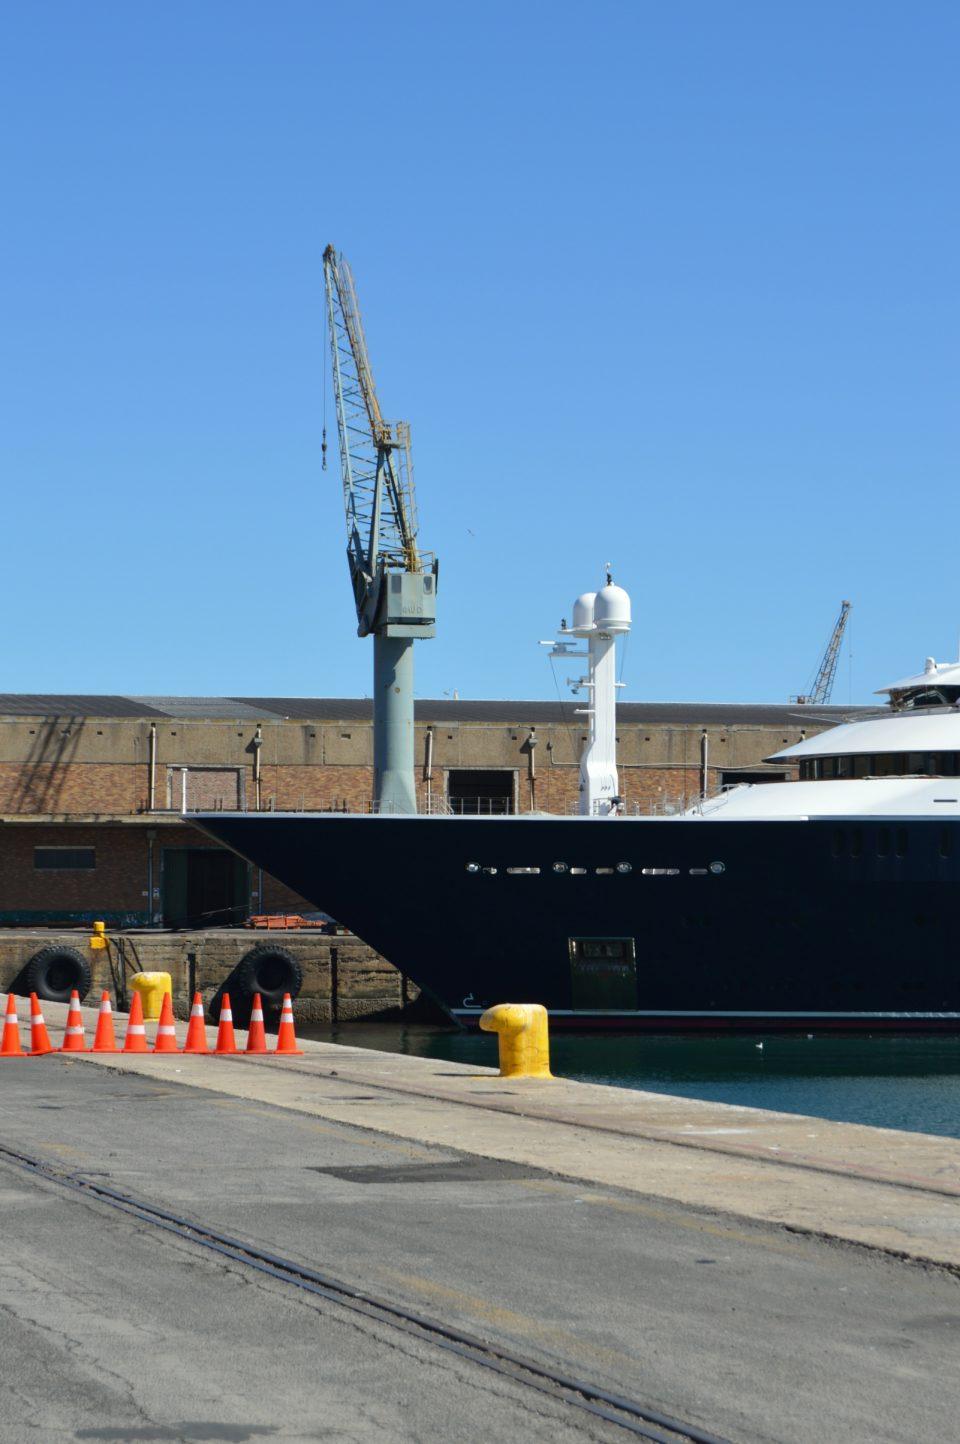 DSC 0007 01 960x1444 - Cruising the Queen Mary 2